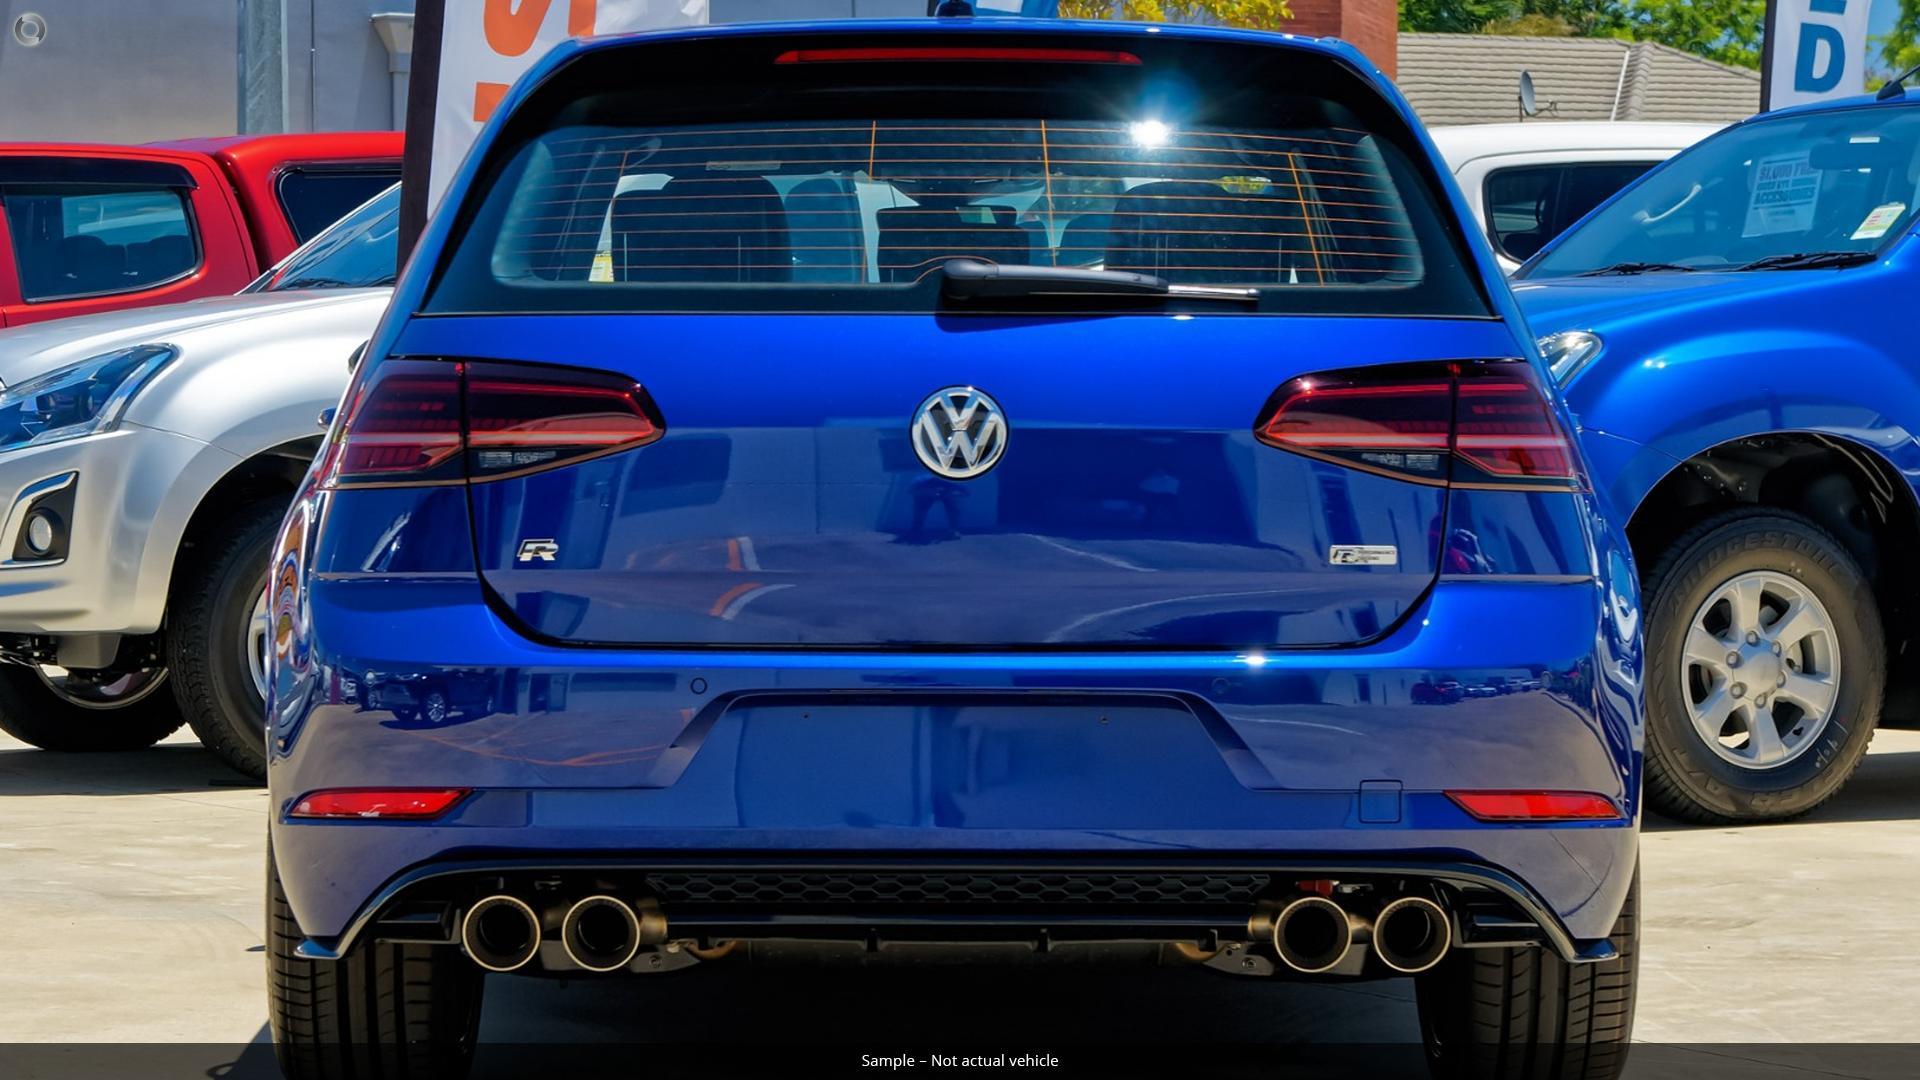 2018 Volkswagen Golf R Special Edition 7.5